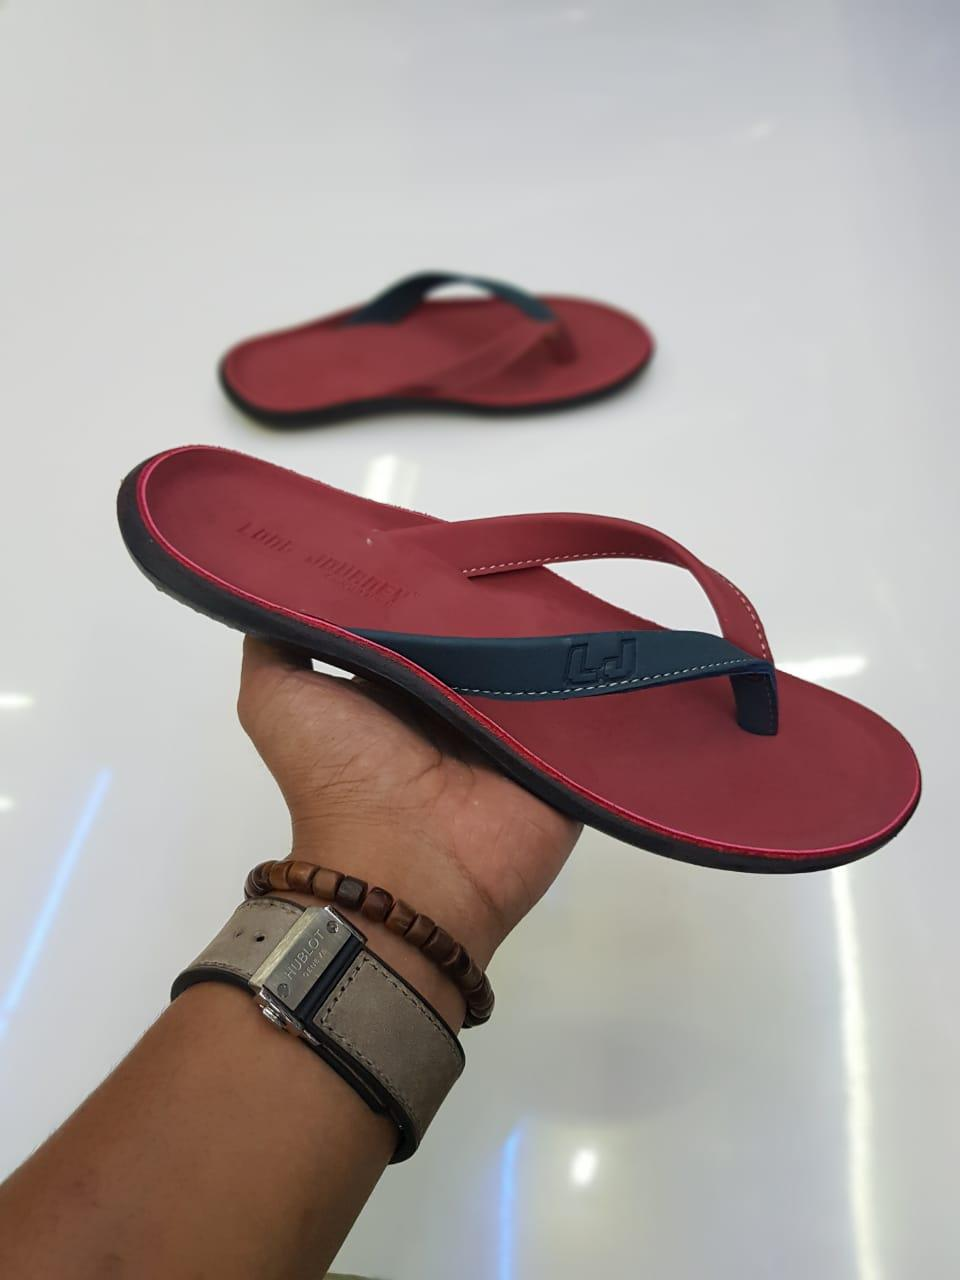 (bayar tempat) sandal kulit pria 100% kulit dengan desaint  high quality -popi ollshop